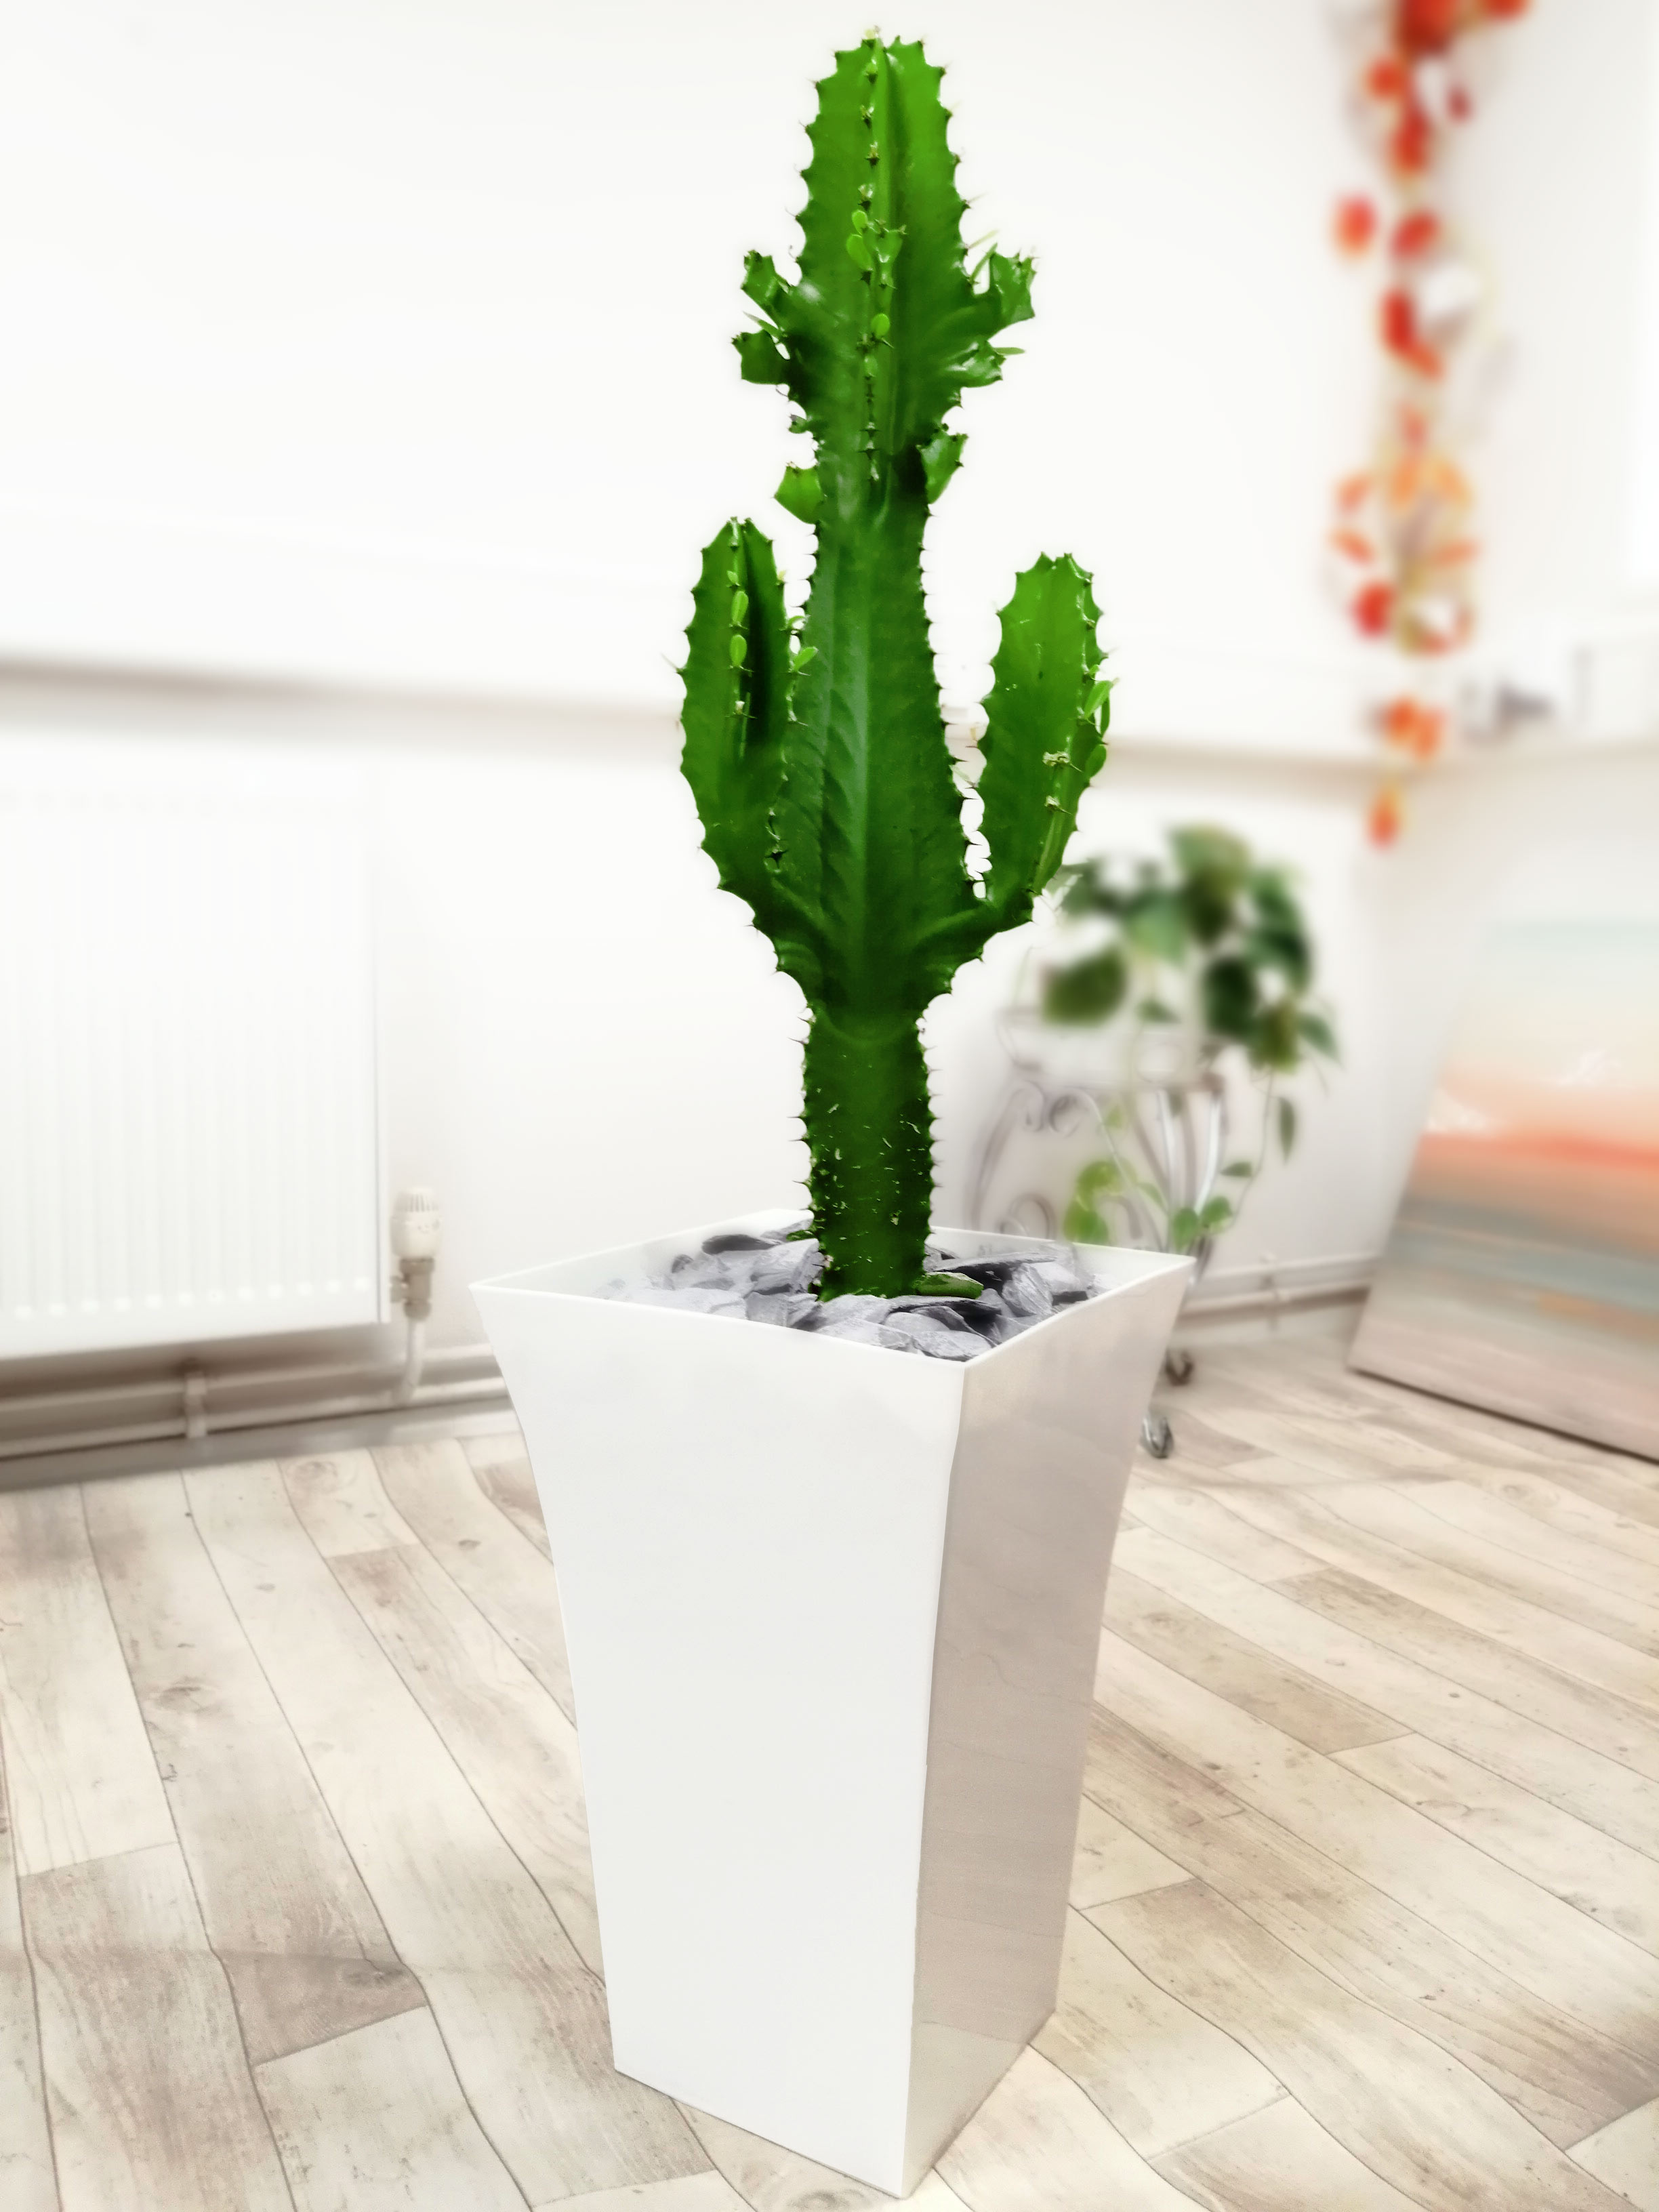 1 Mature Euphorbia Ingens Cowboy Cactus in Pot House ...